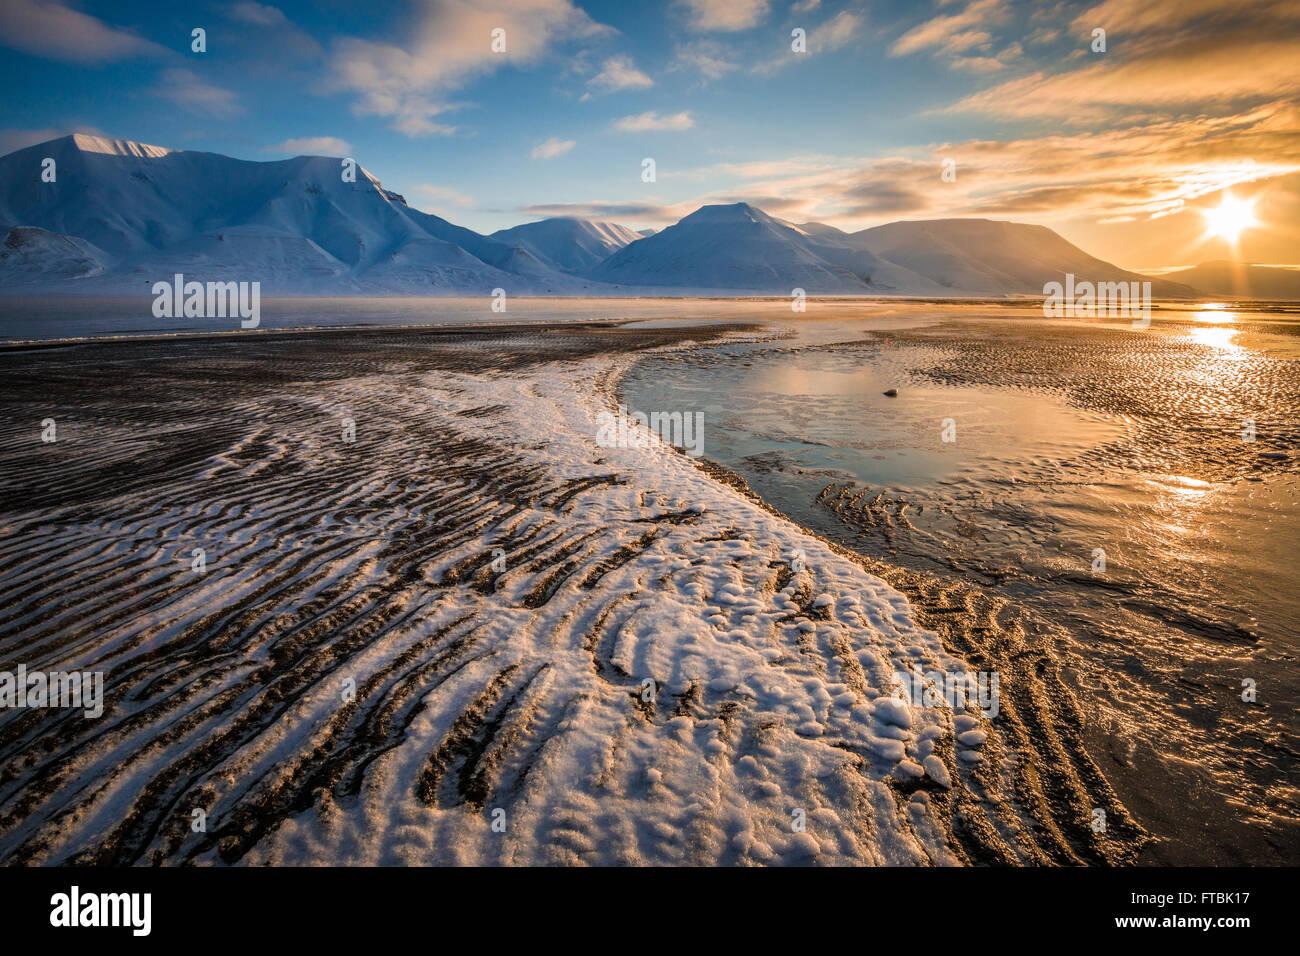 Formaciones de hielo sobre Sjøskrenten Sunrise Beach con vistas a Hiorthfjellet, Longyearbyen Spitsbergen, en Svalbard. Foto de stock